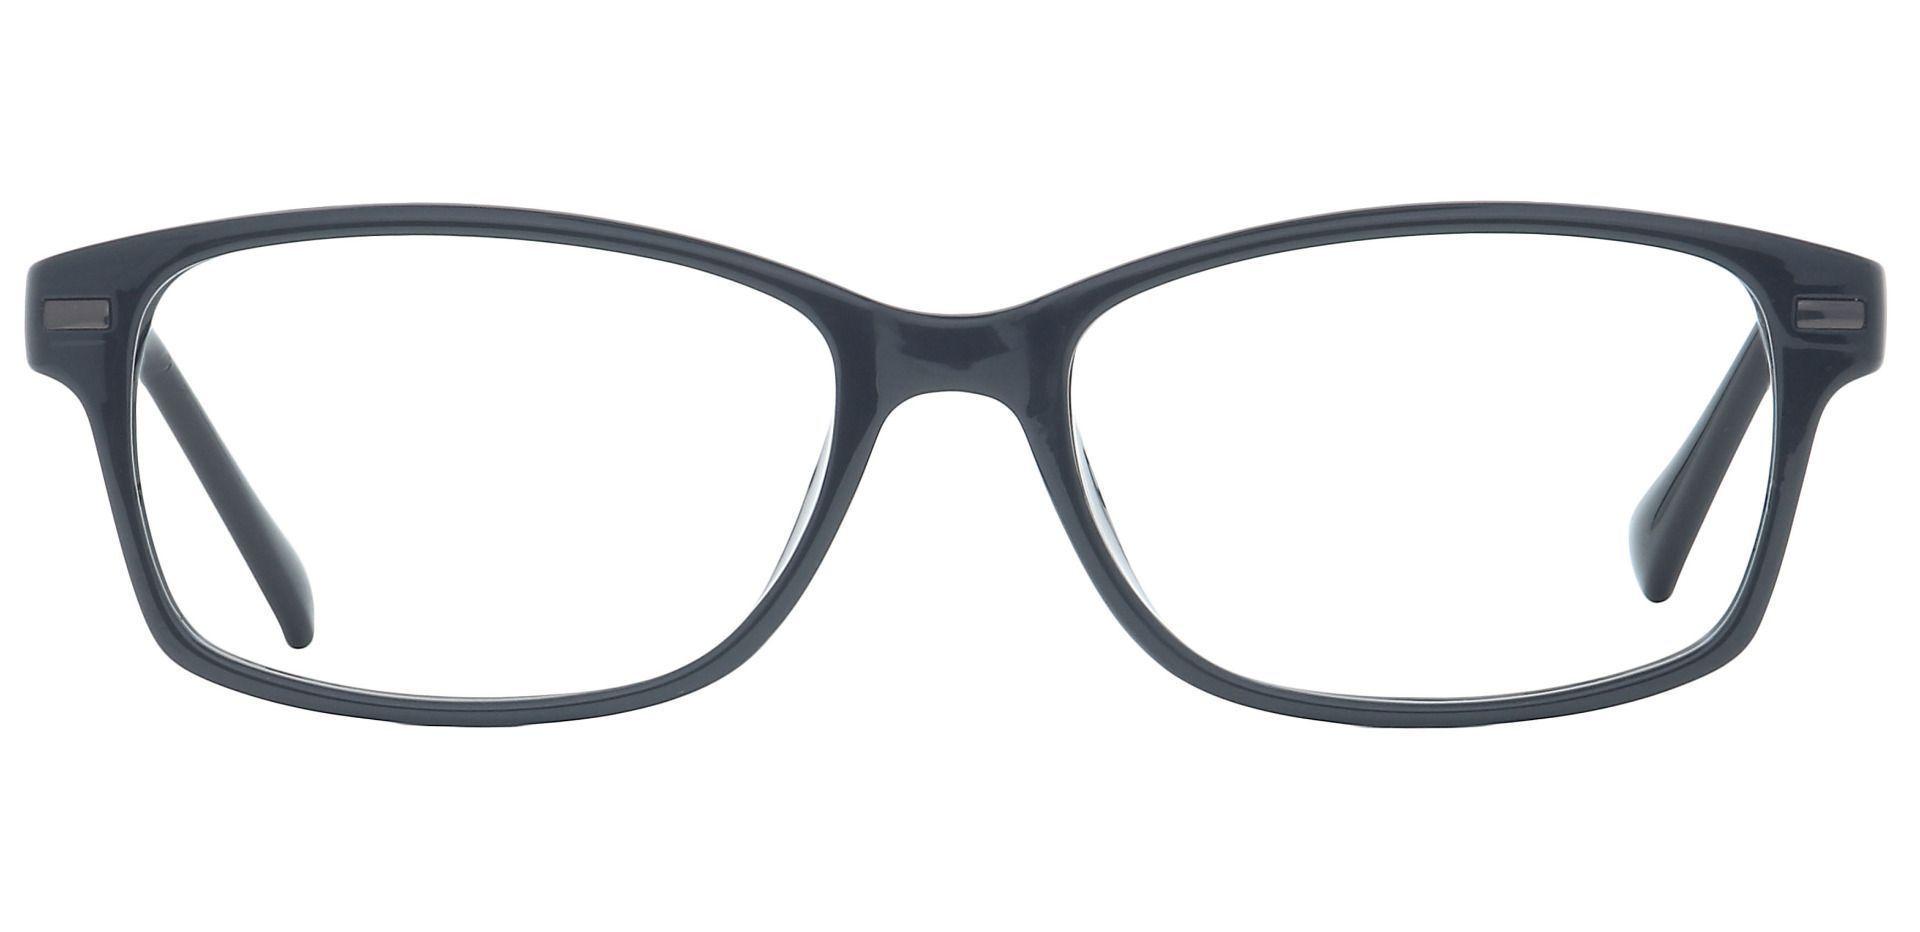 Dixie Rectangle Prescription Glasses - Black